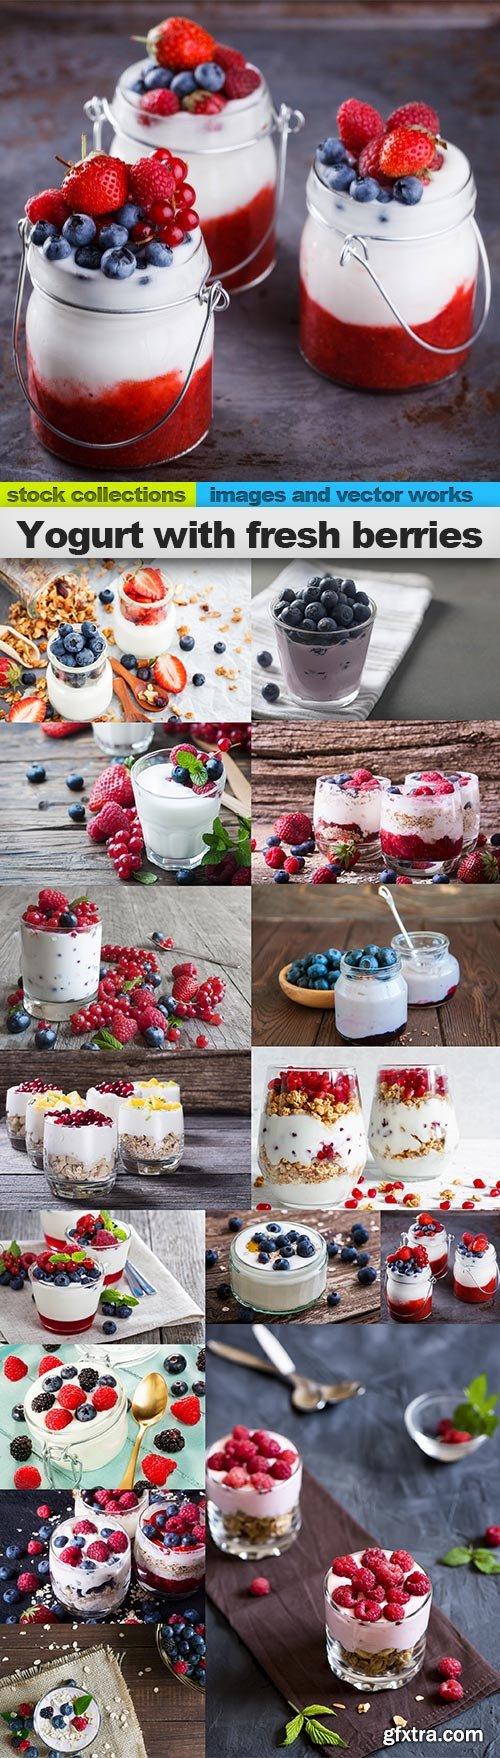 Yogurt with fresh berries, 15 x UHQ JPEG